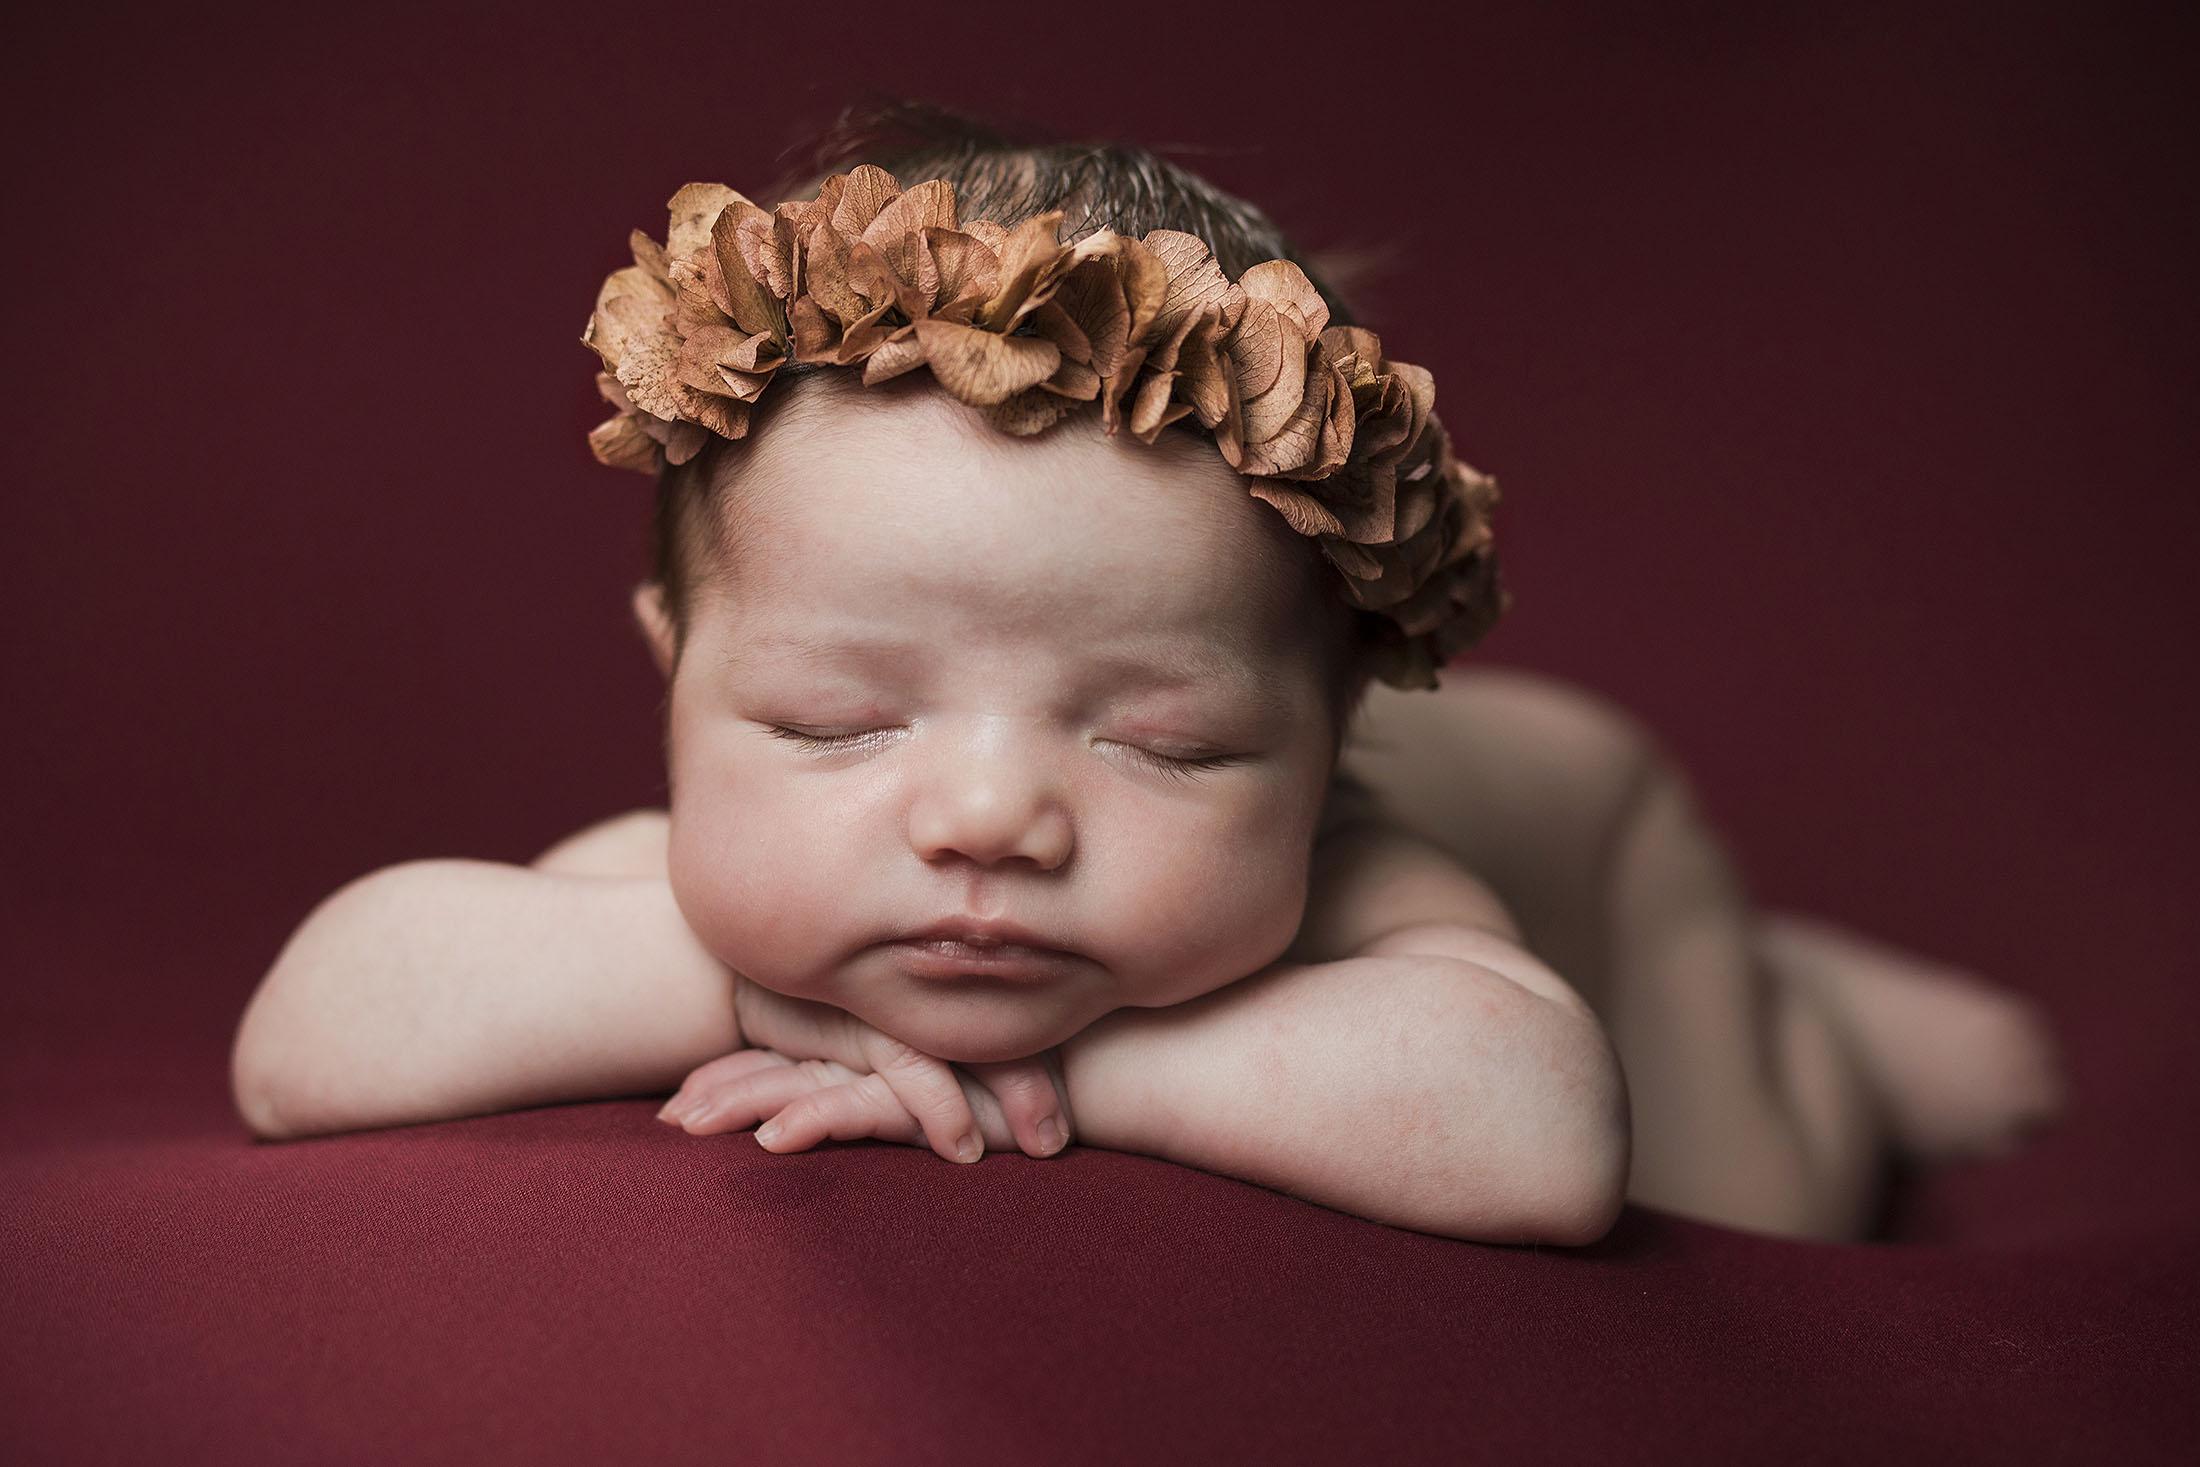 fotografa de bebes en avila